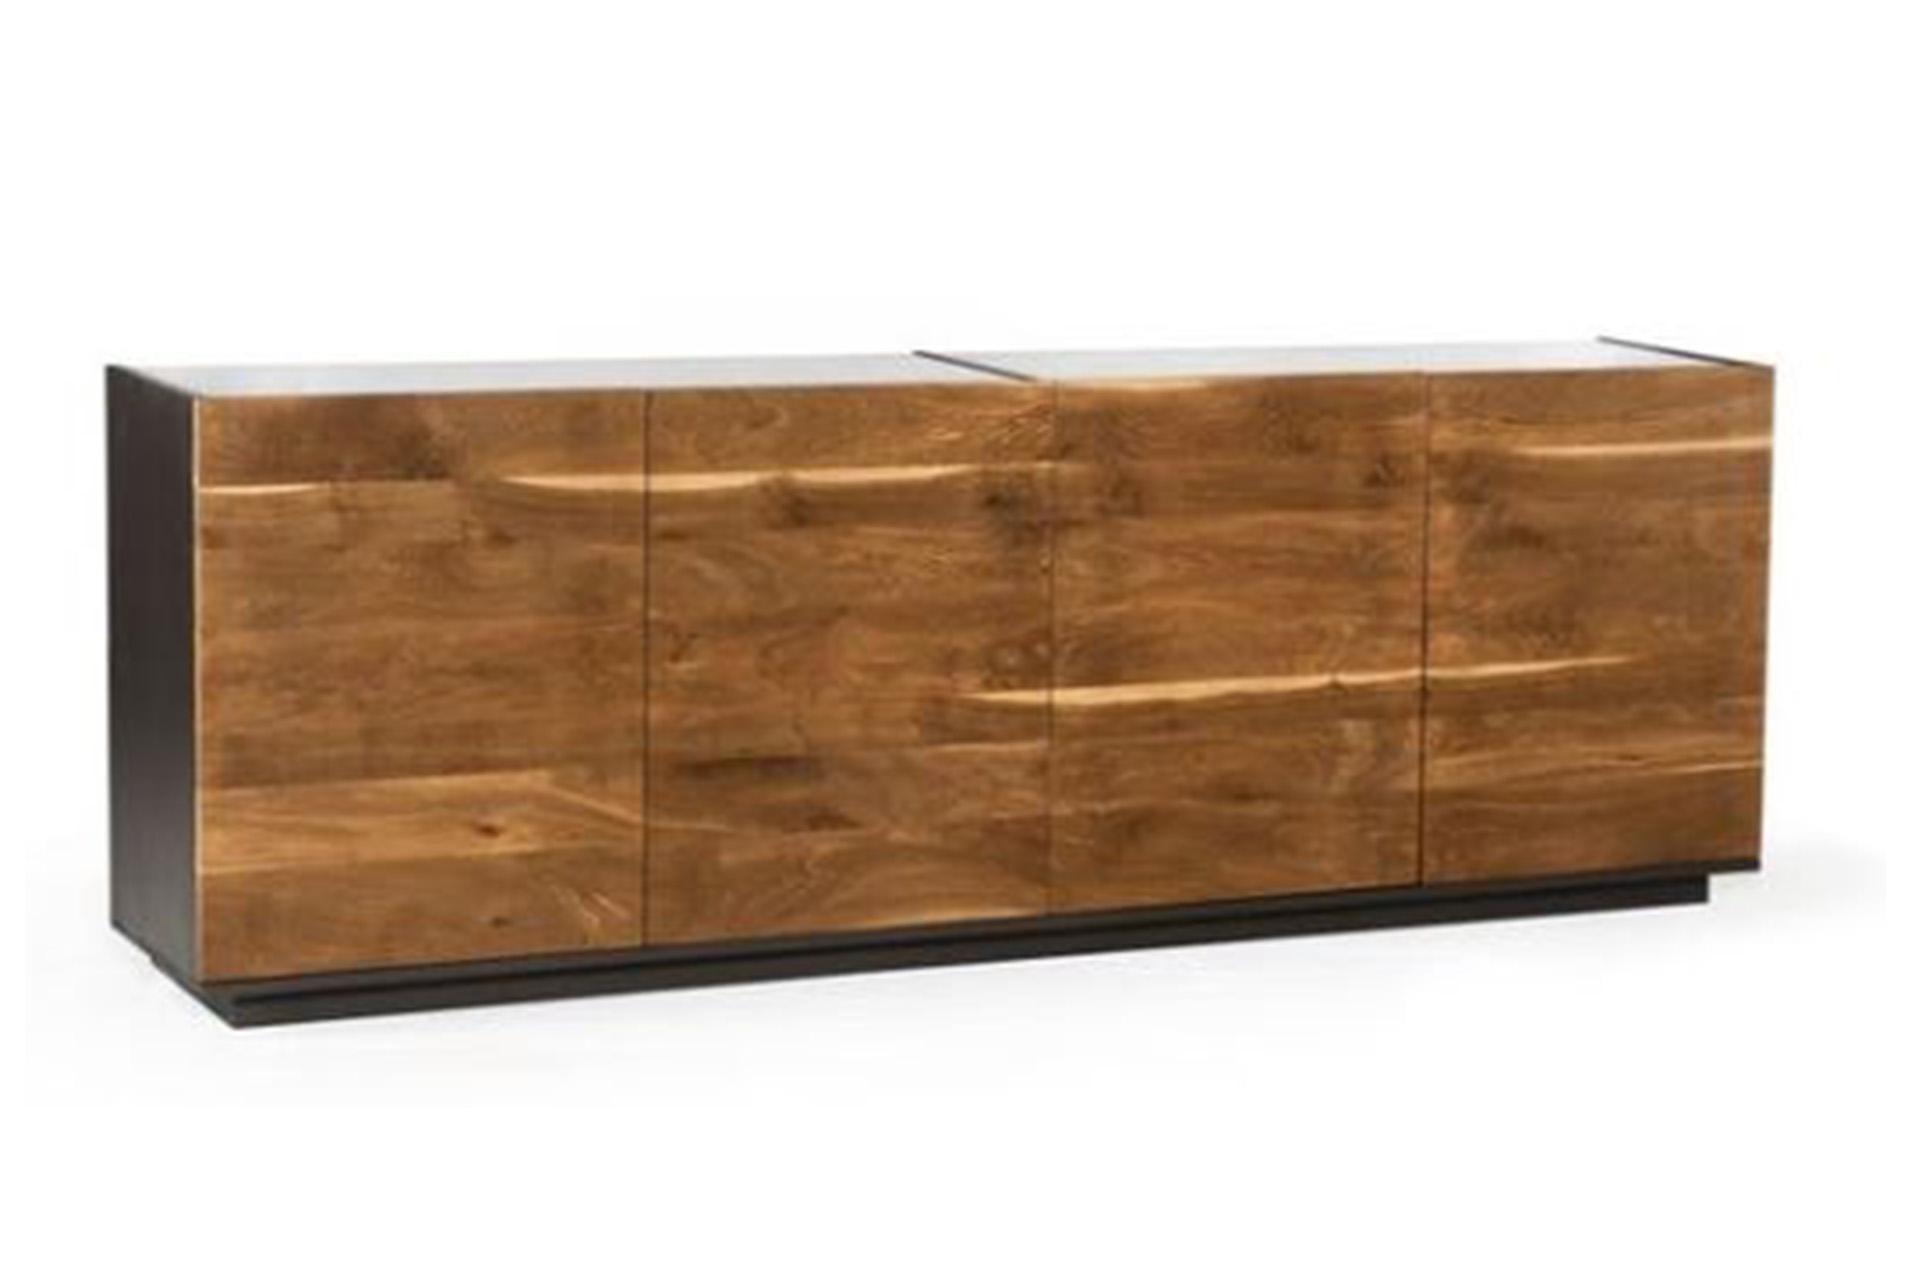 Credenza Dark Wood : Dark wood traditional credenza